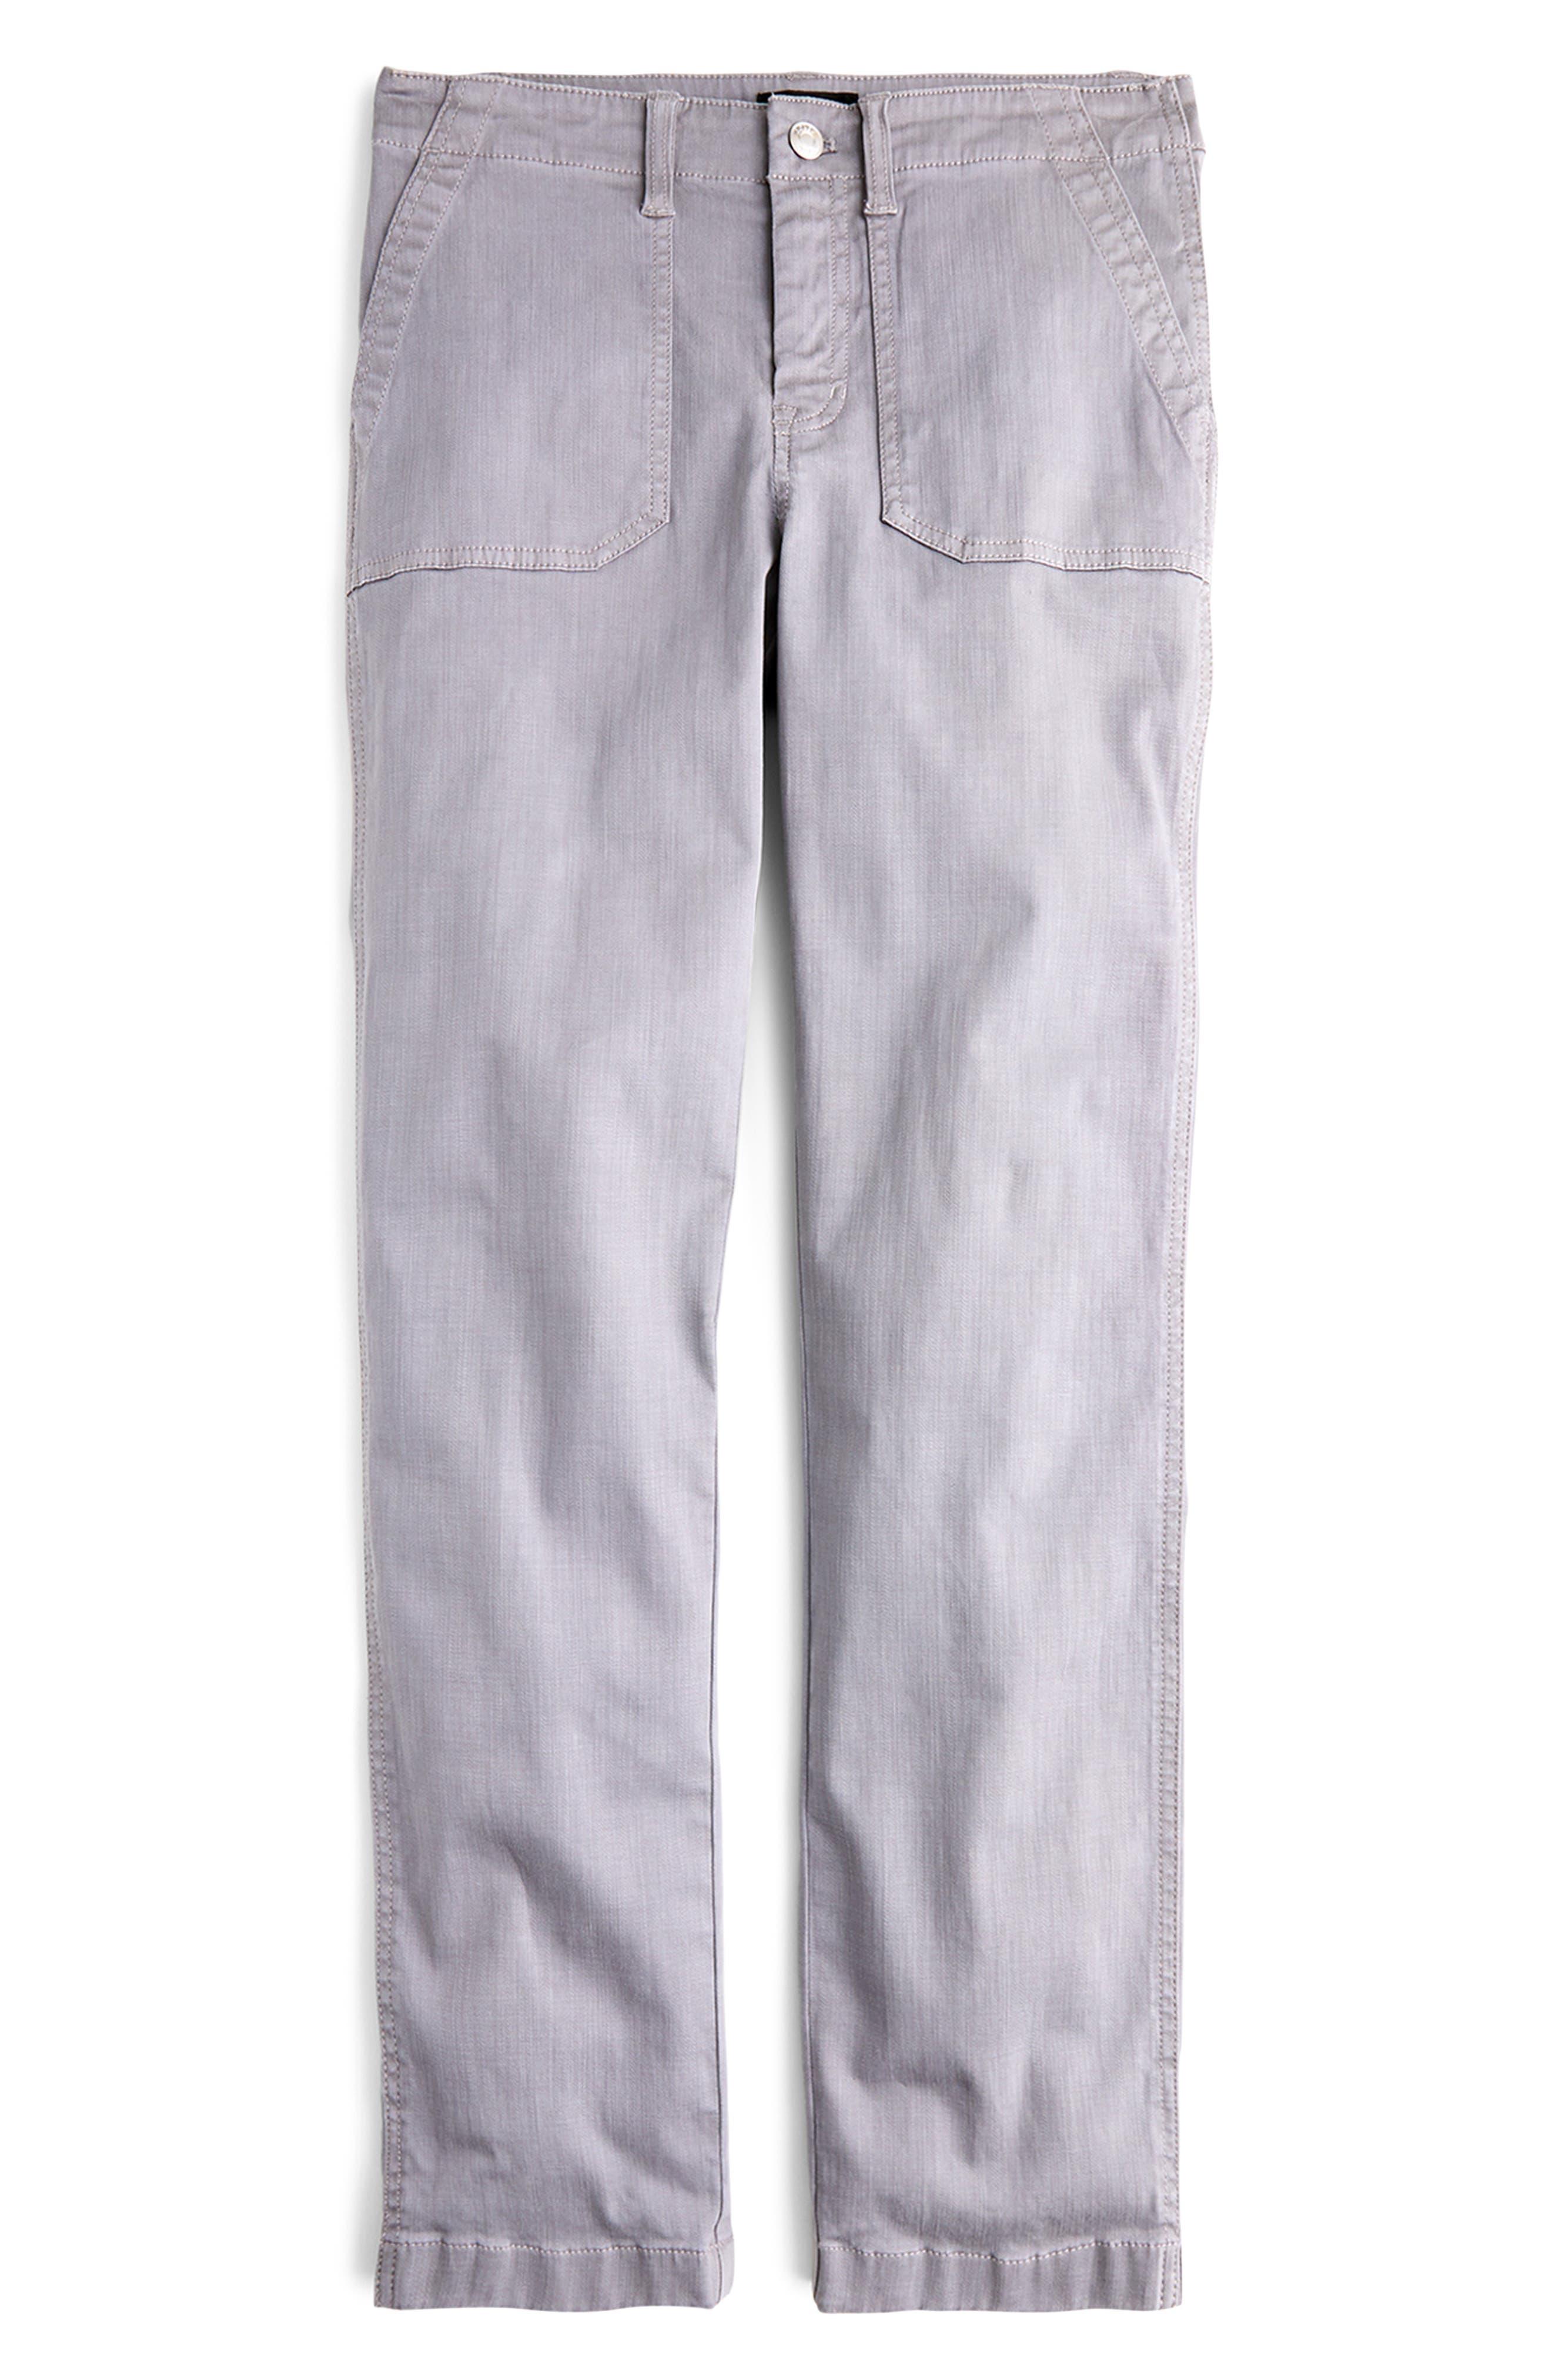 J.crew Slub Sateen Straight Leg Cargo Pants, Grey